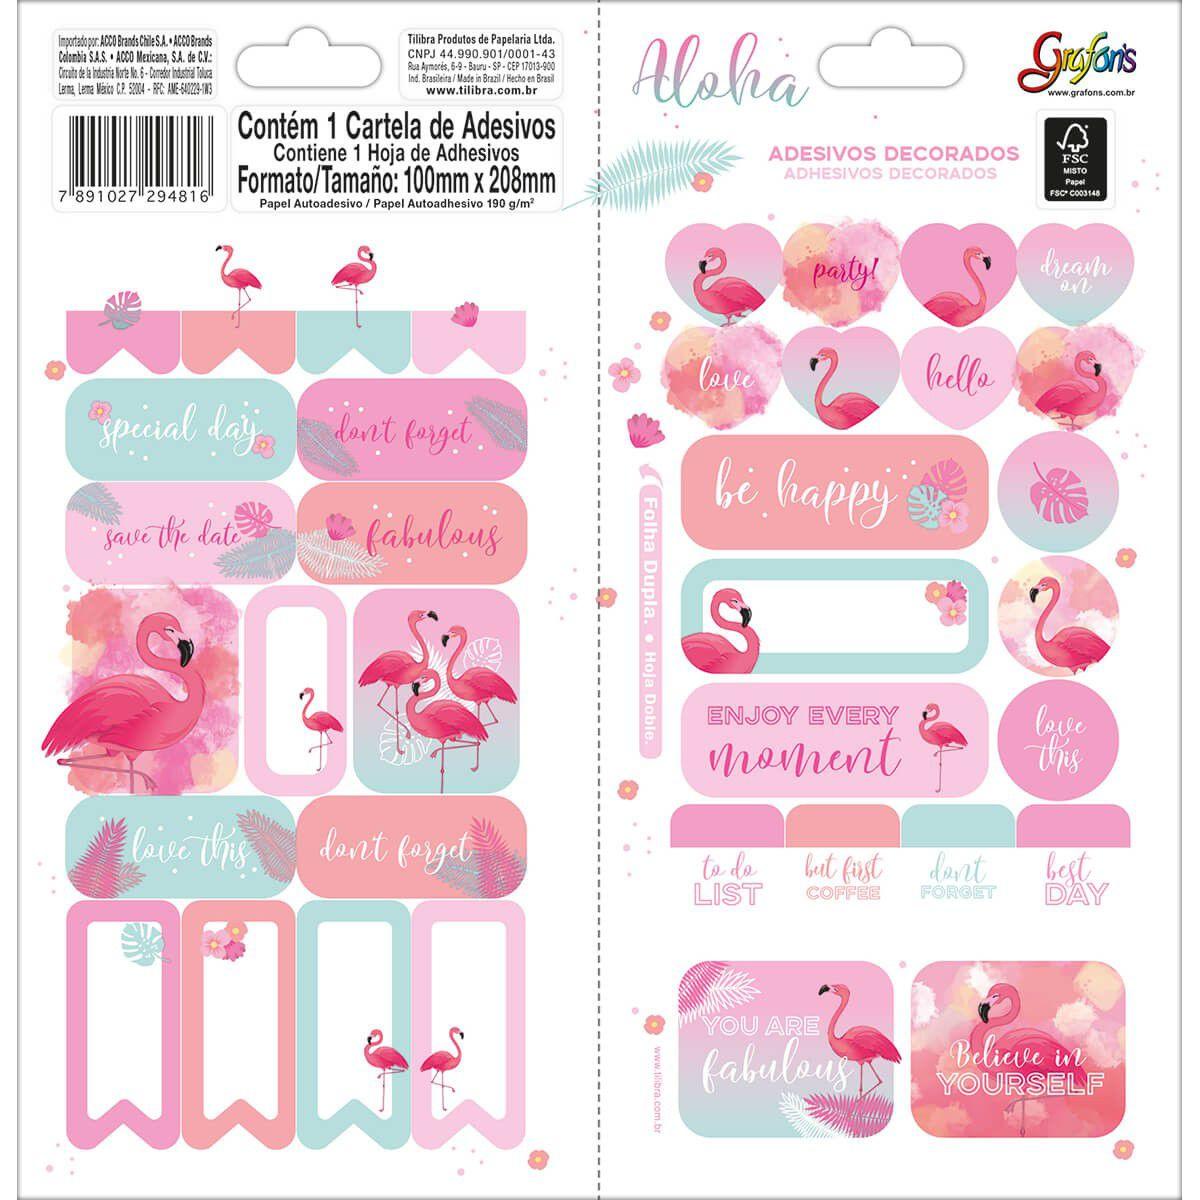 Adesivos Decorados Aloha Flamingo